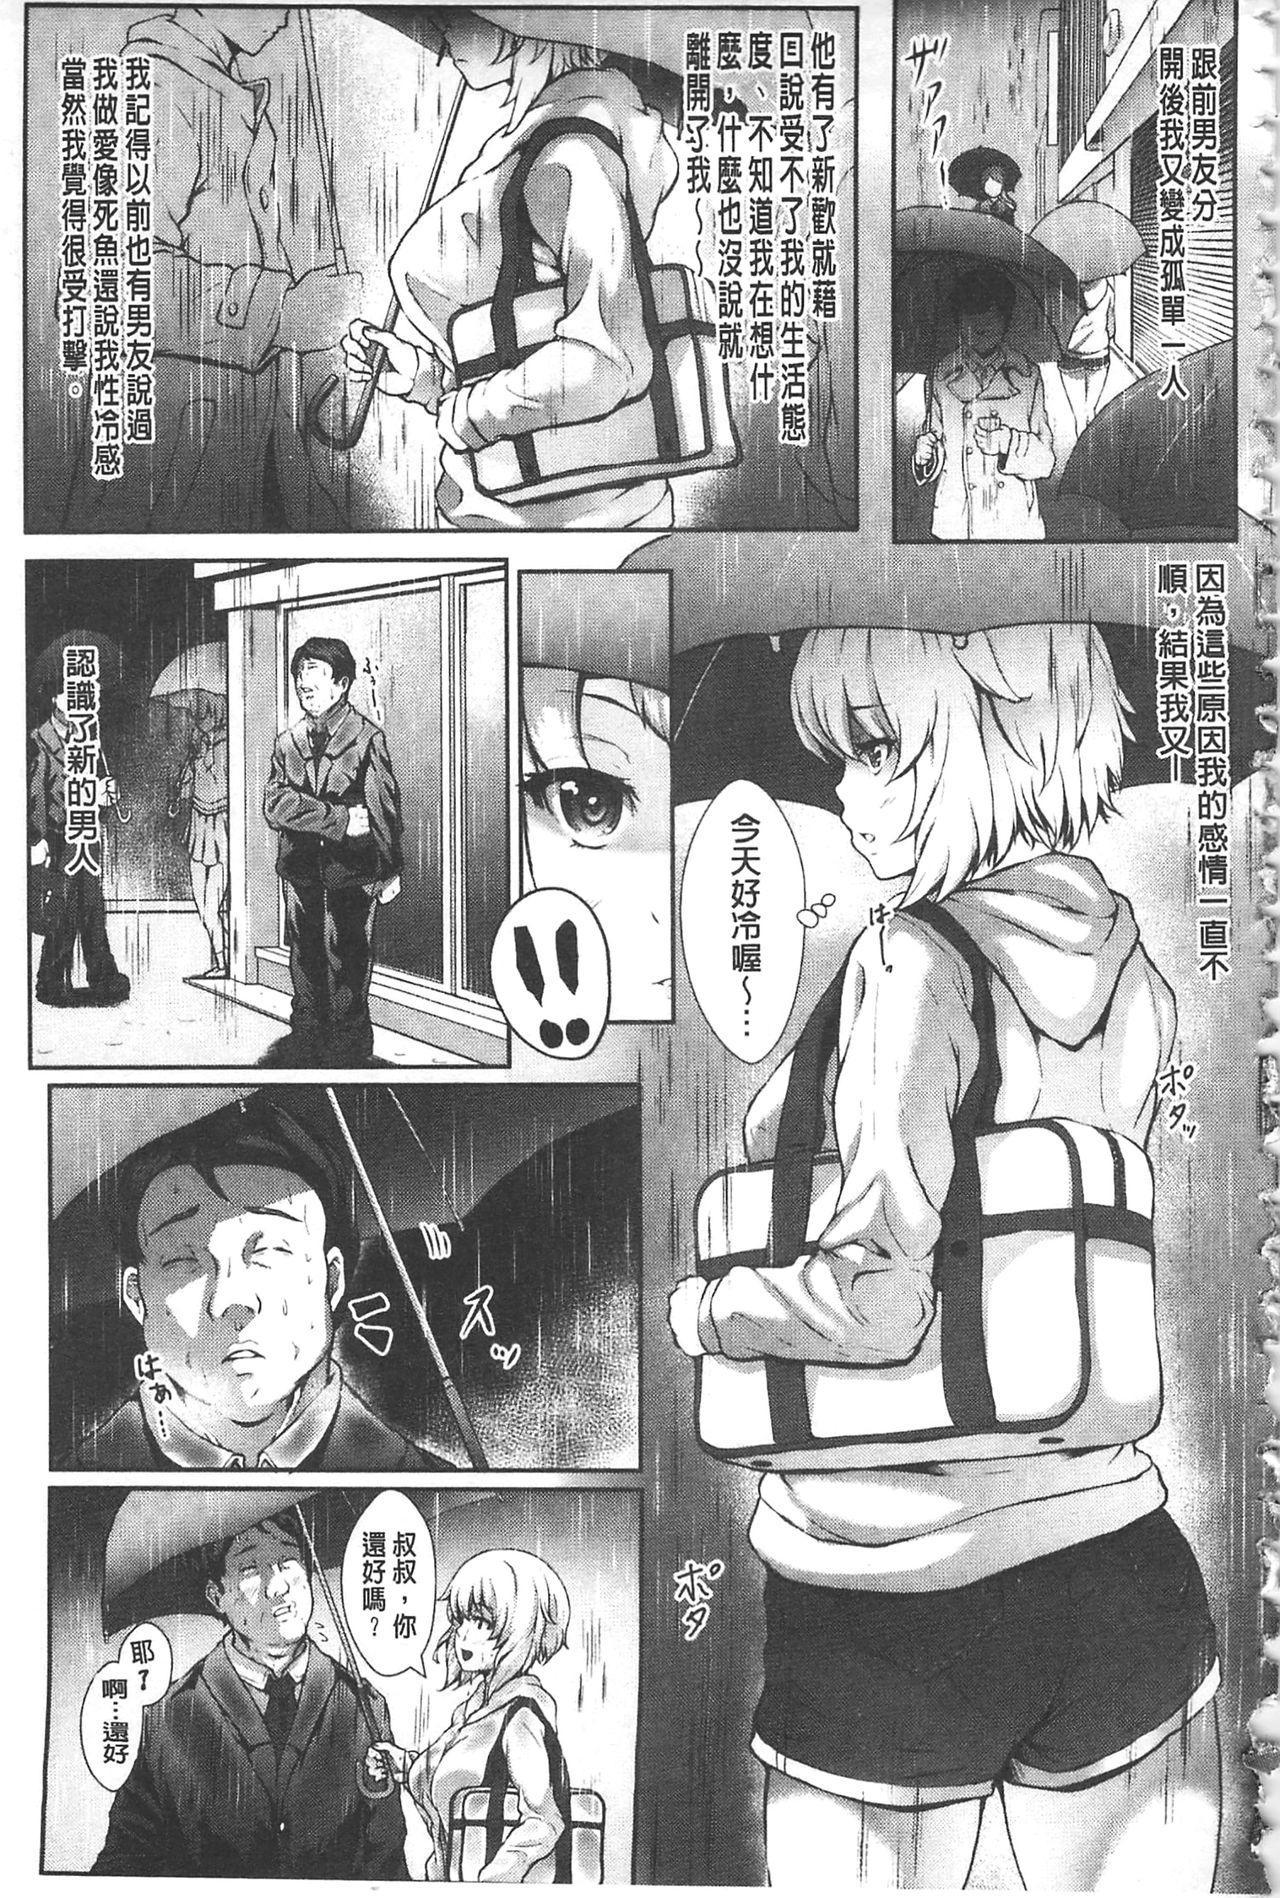 [Lorica] Biinkan Anal ~Kakusei Nejikomi Ana~ | 美淫感猥菊花 塞入擴張覺醒穴 [Chinese] 89